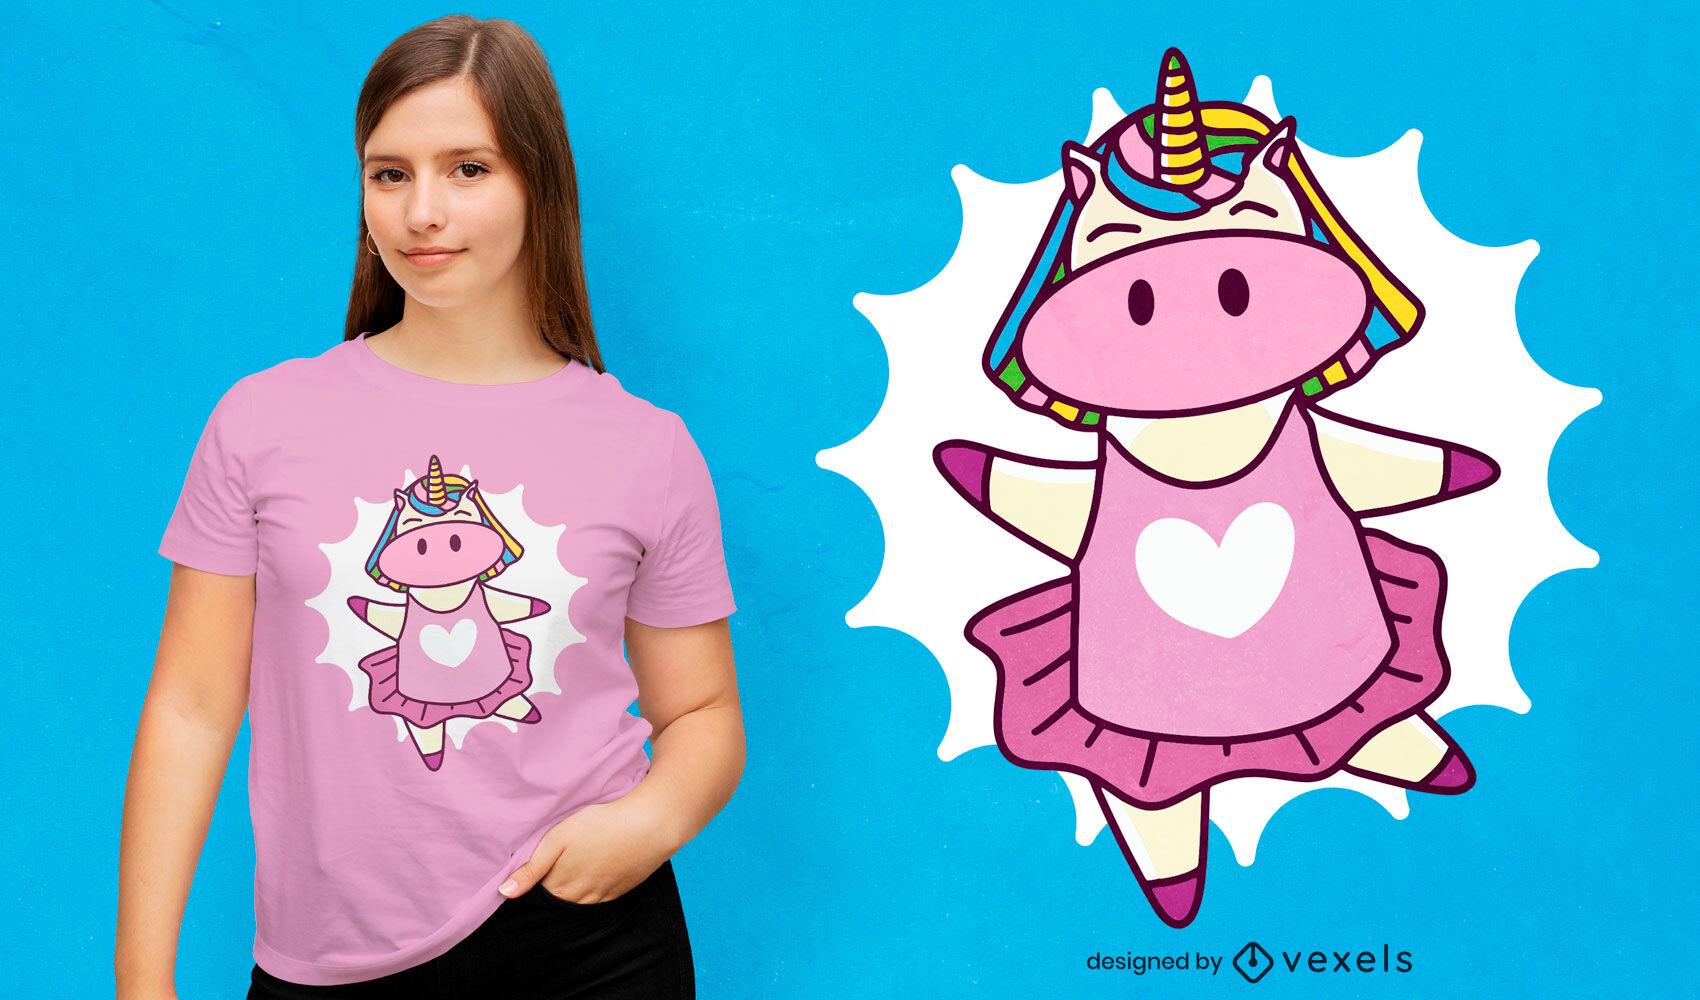 Diseño de camiseta de dibujos animados de unicornio de ballet.